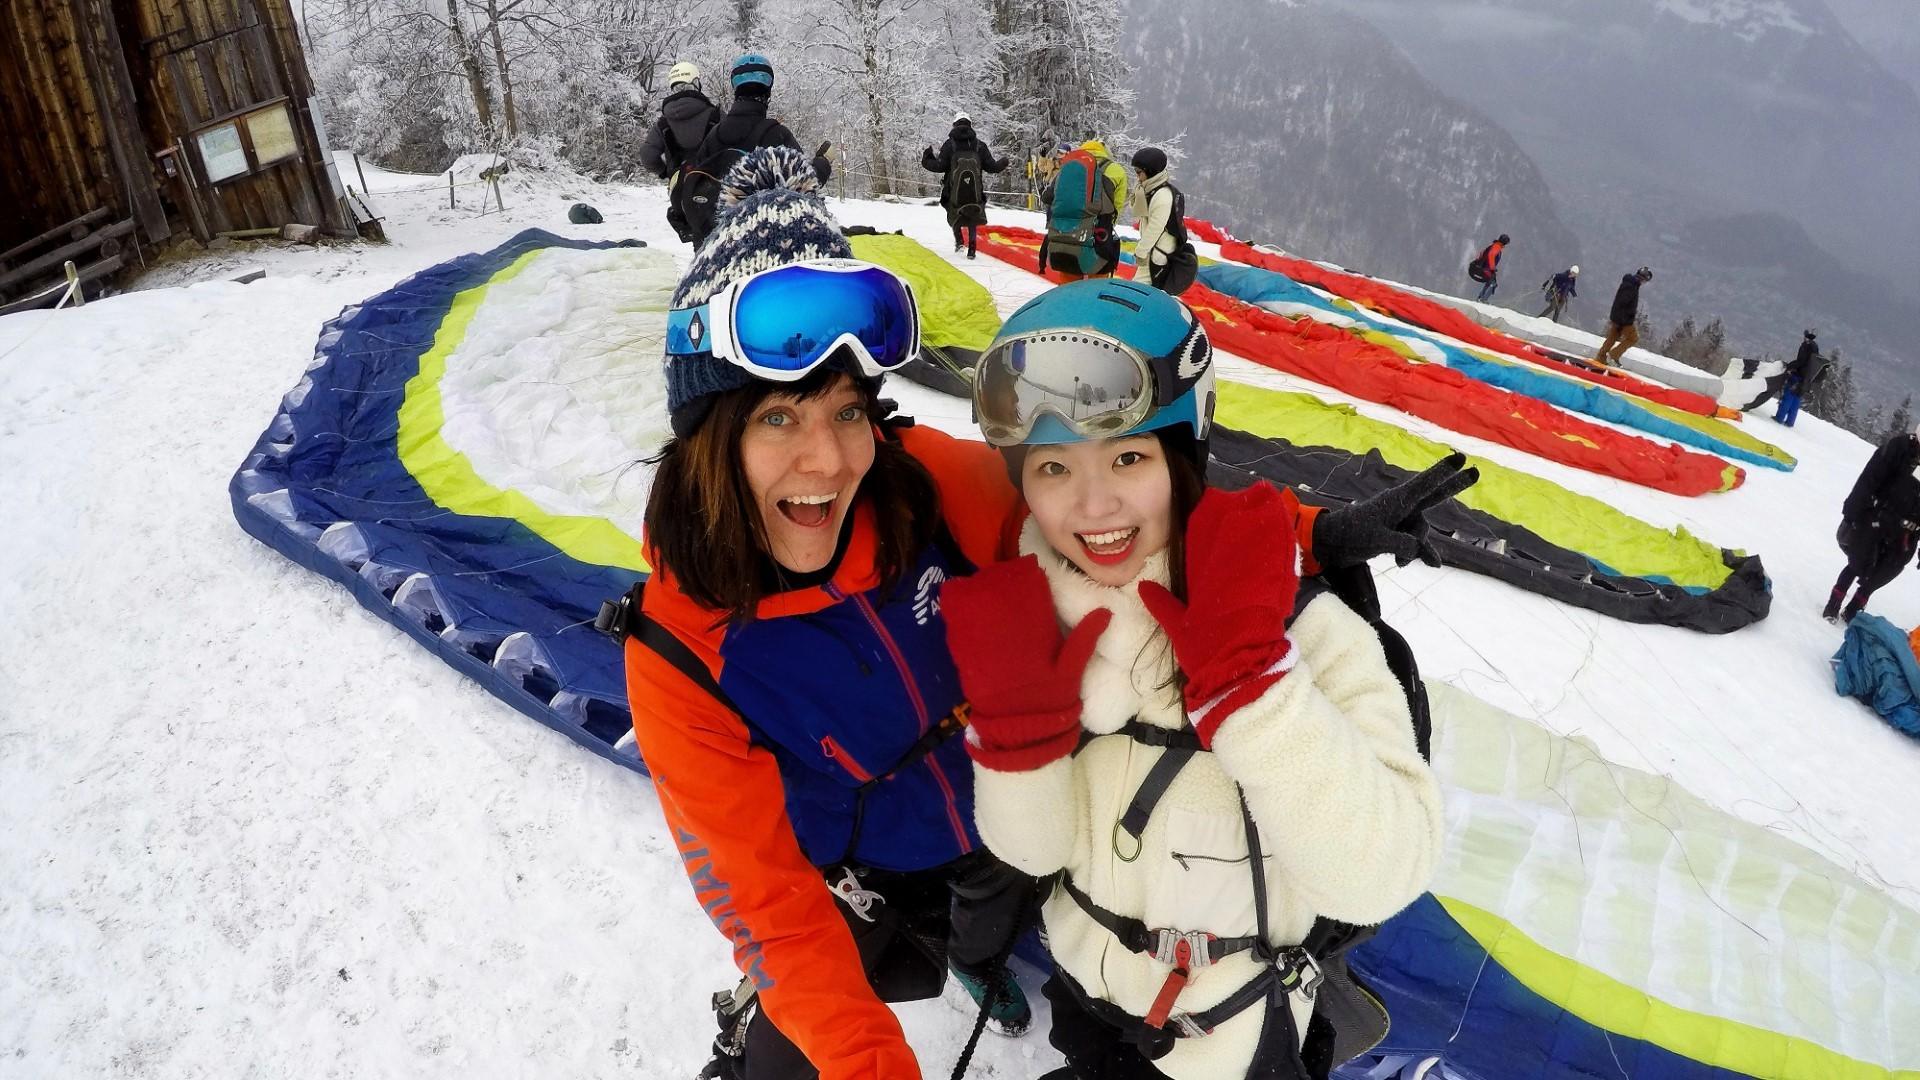 Interlaken Winter Paragliding Wonderland Winterlaken 12 - Copy - Copy